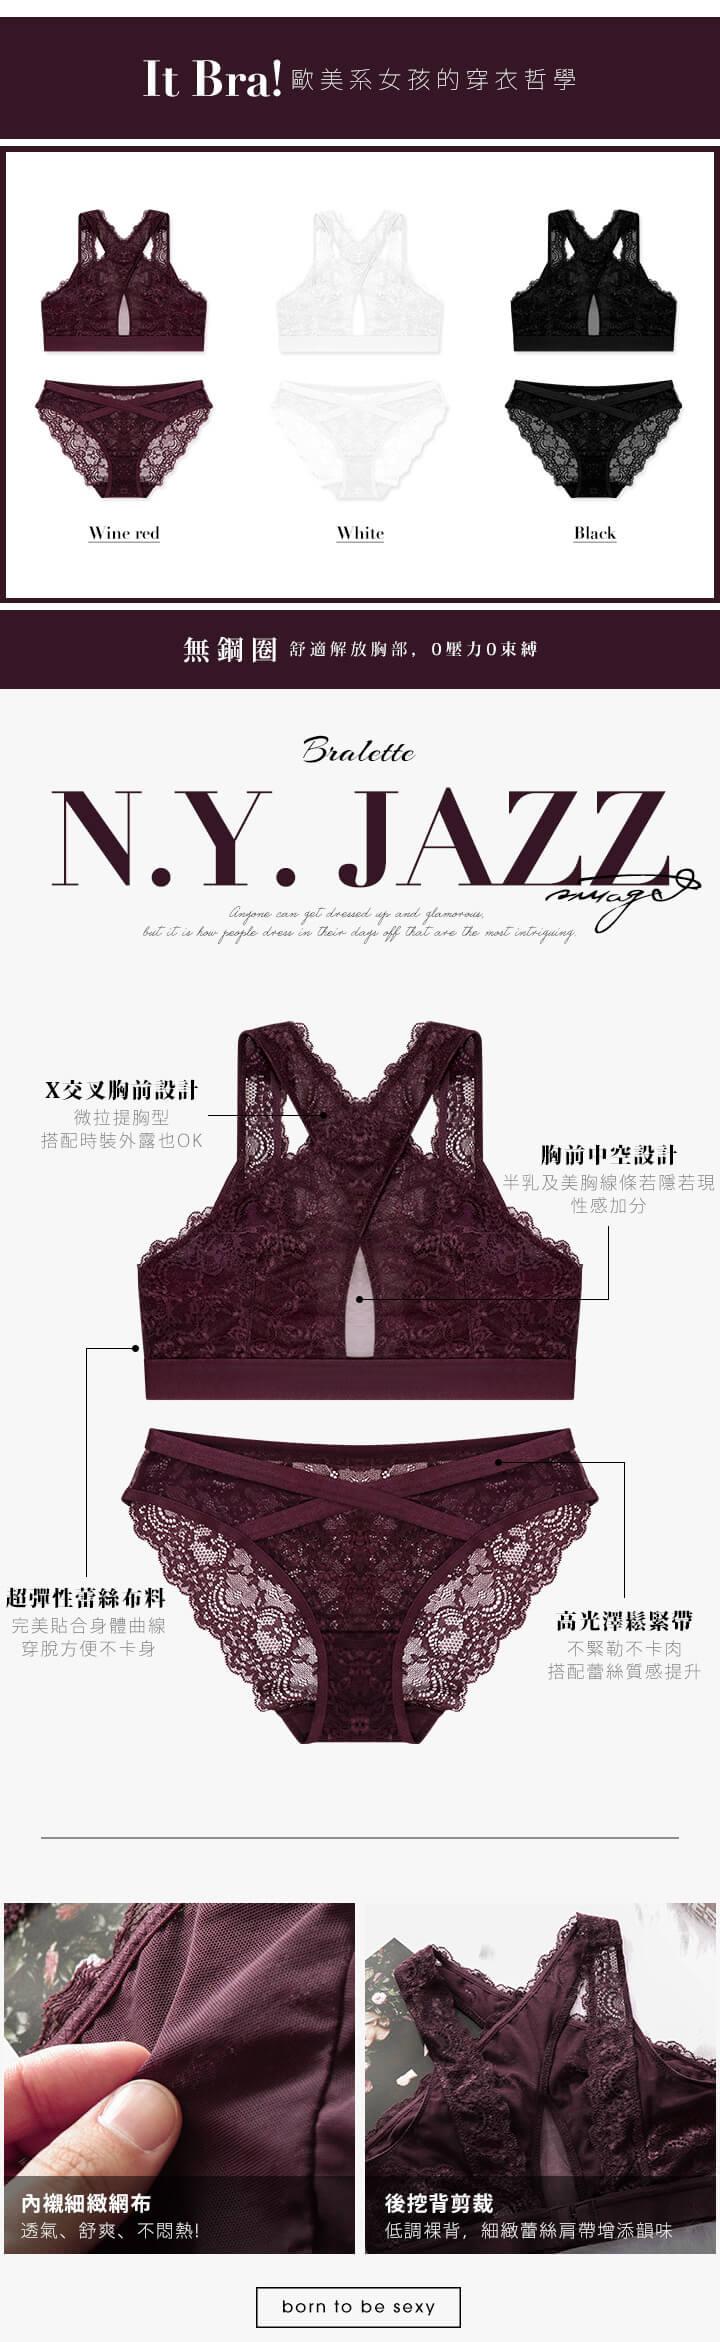 Qmomo N.Y. JAZZ紐約爵士蕾絲無鋼圈成套內衣